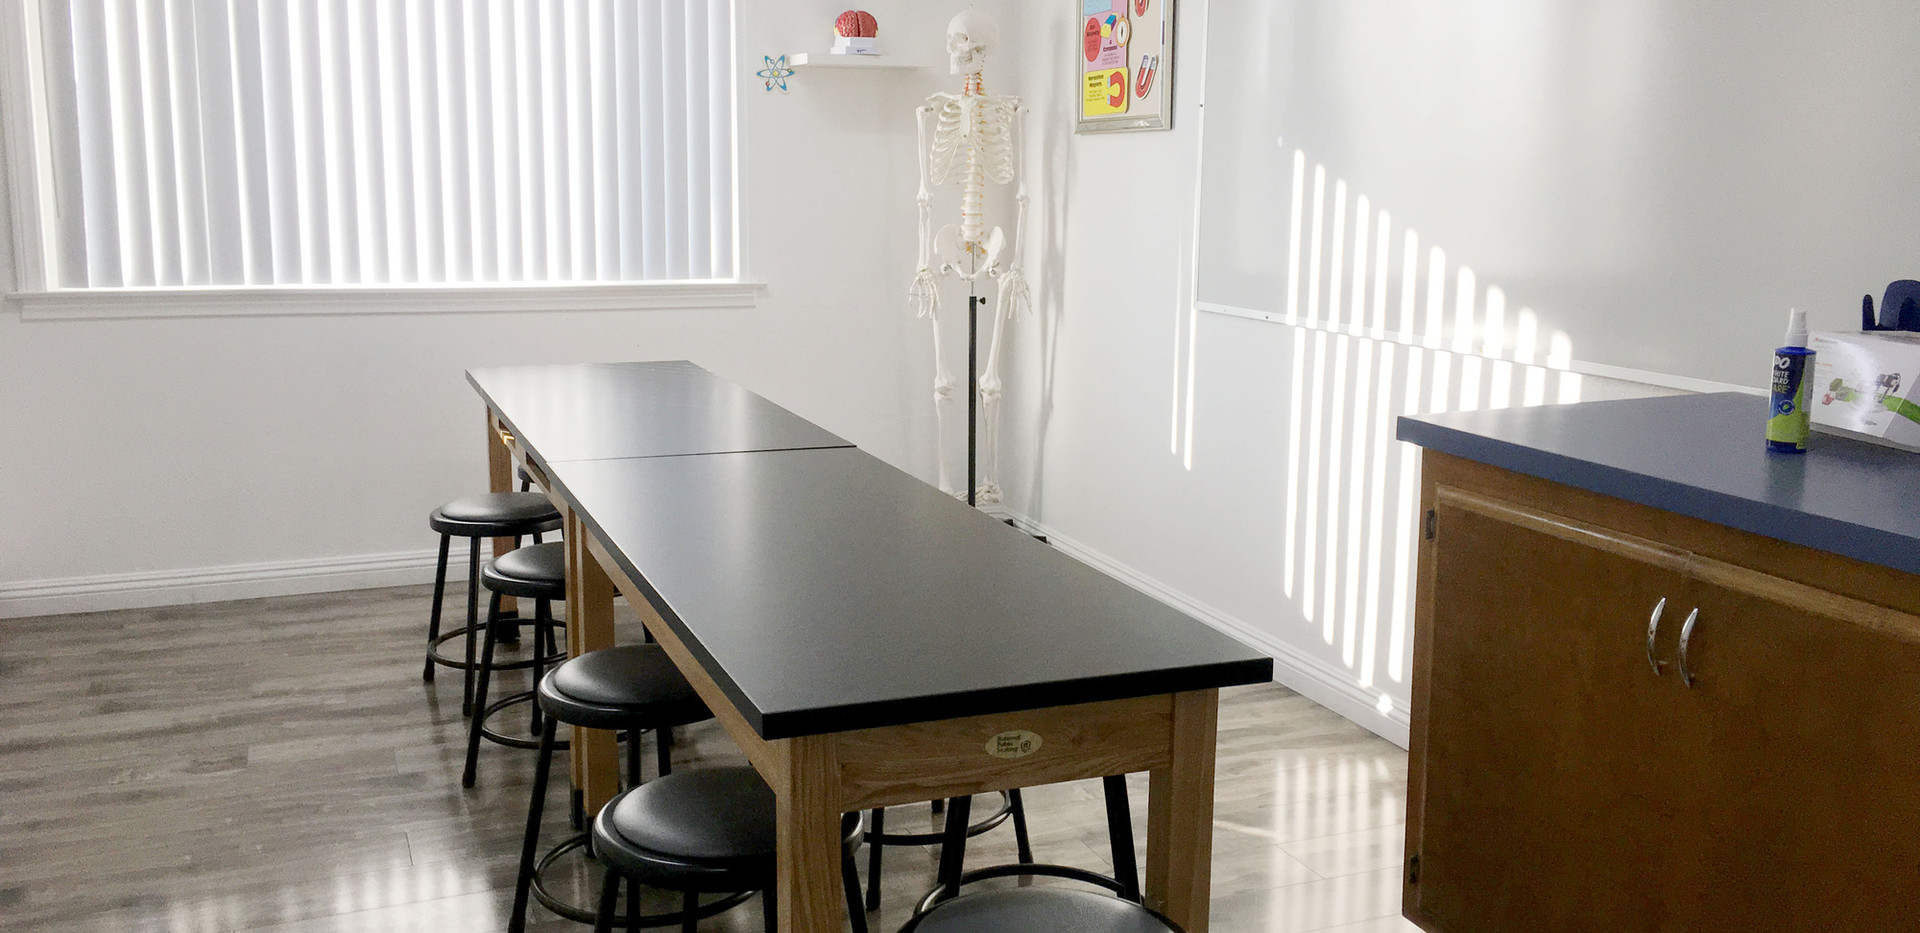 facilities_0008_IMG_0664.JPG.jpg